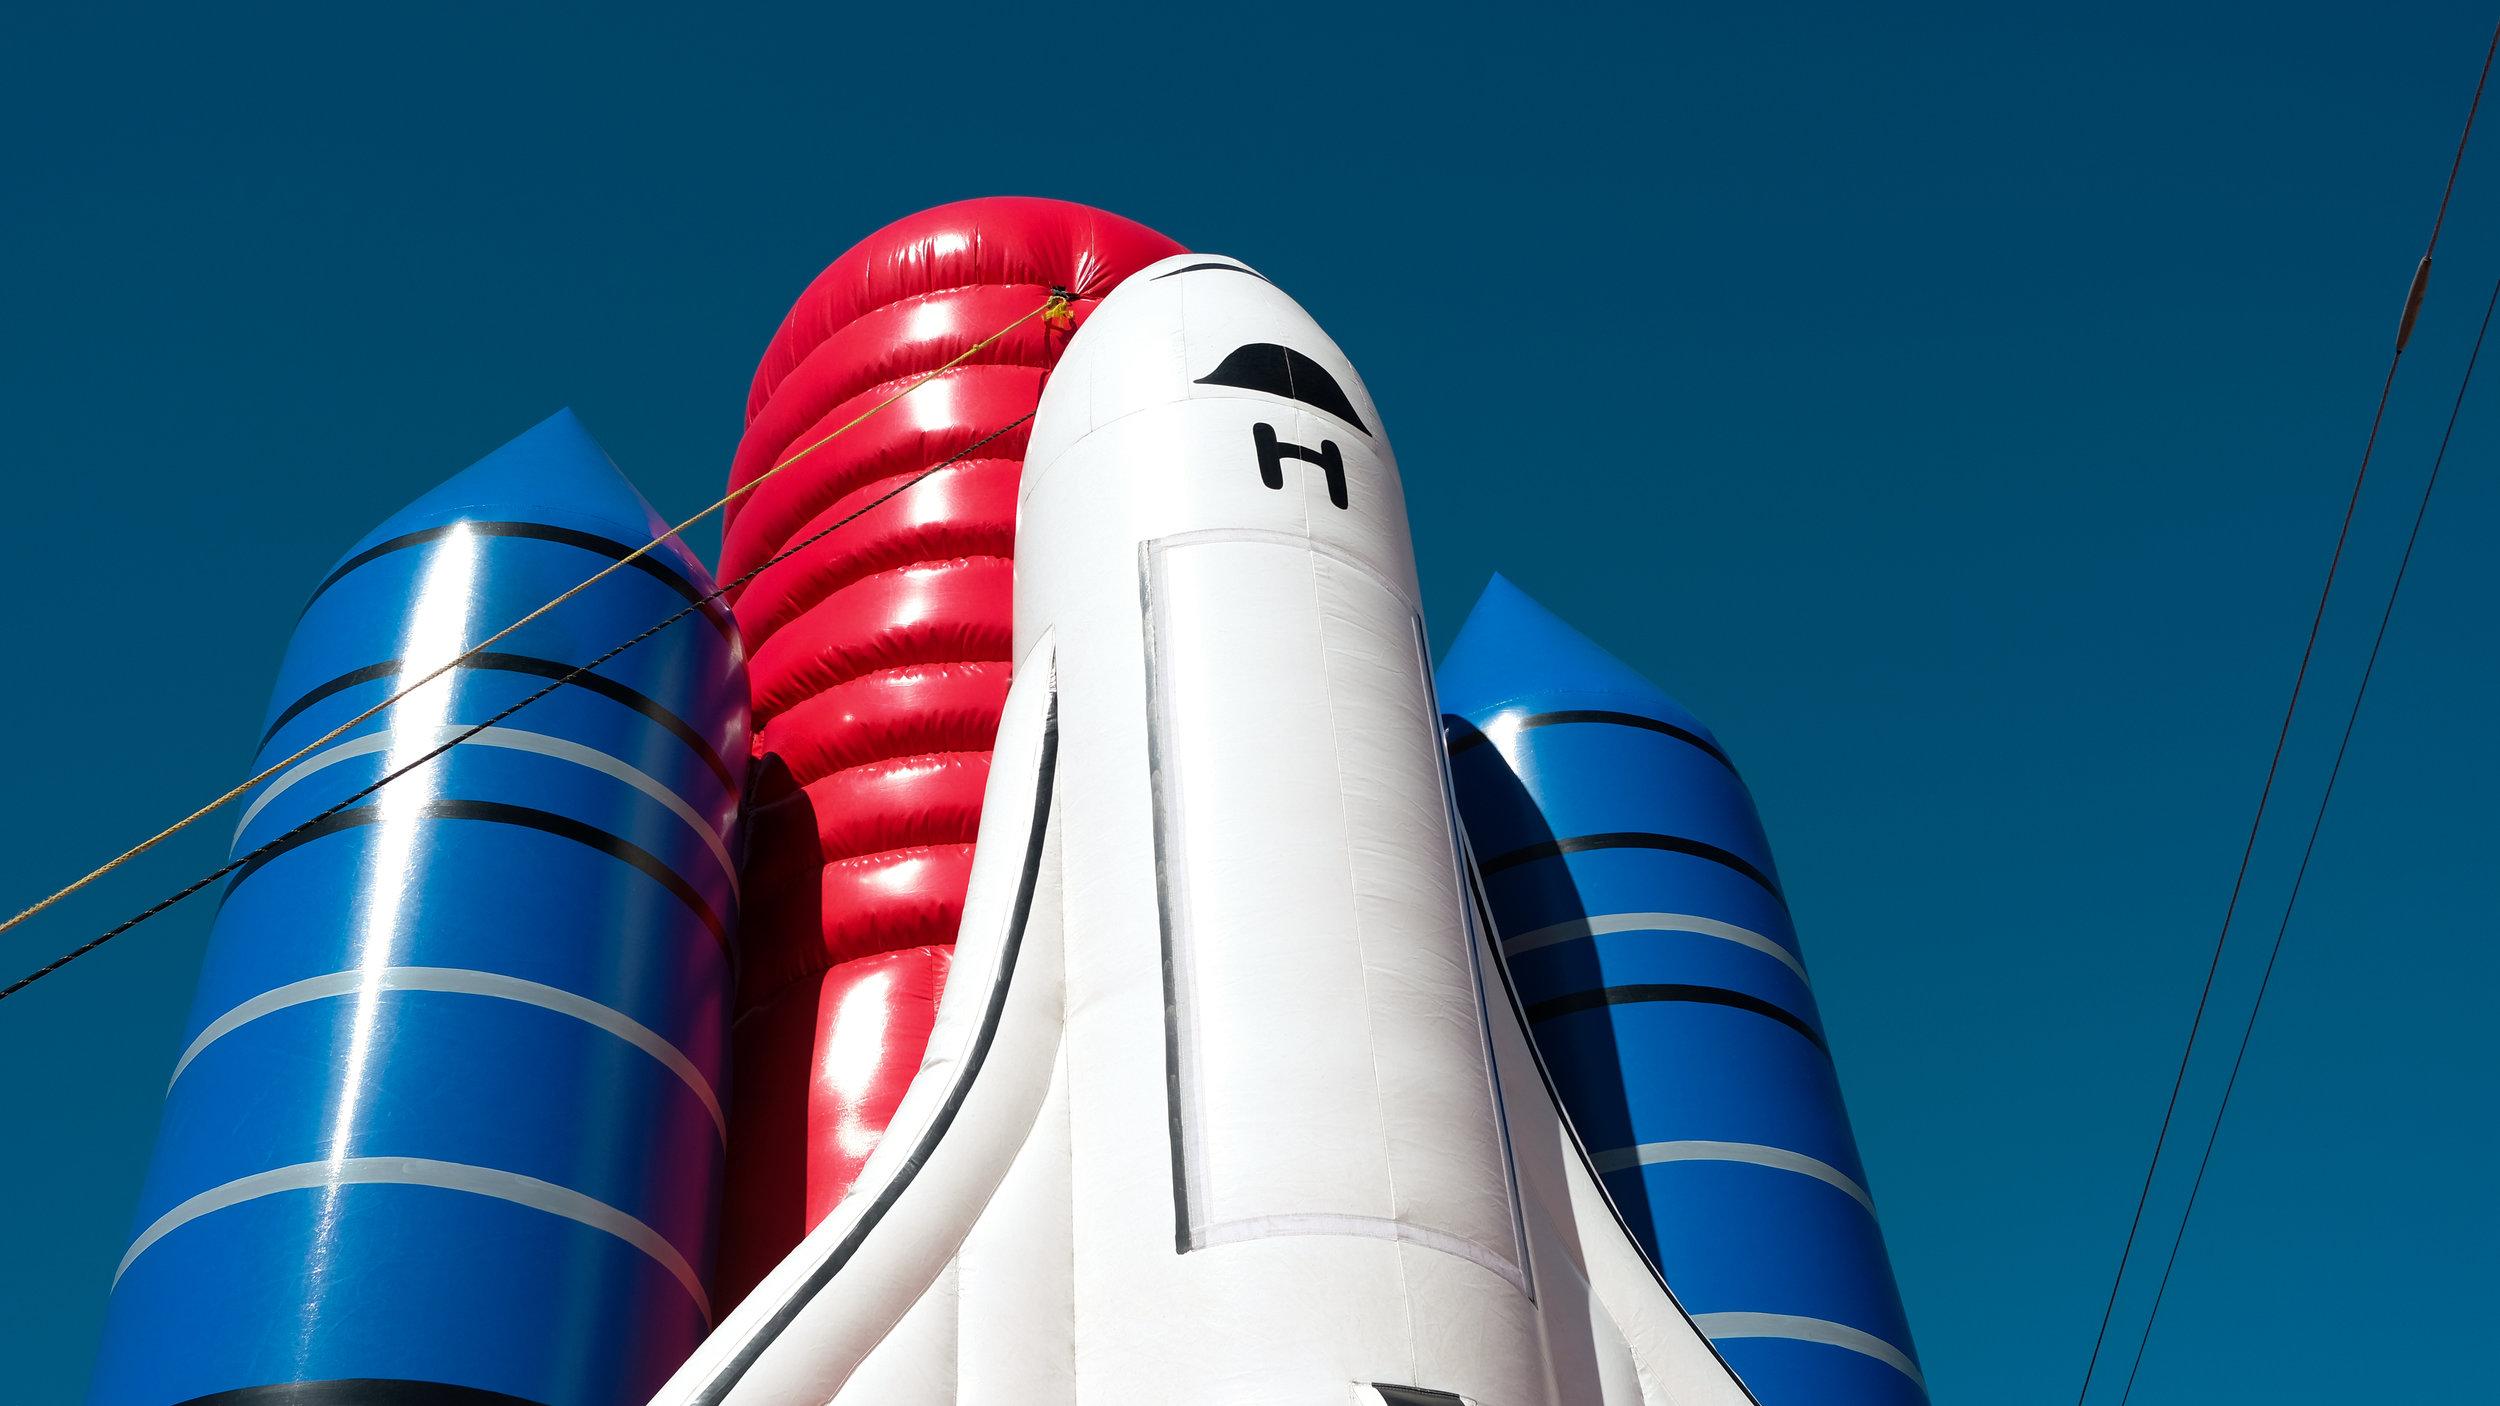 14_SAN-FRANCISCO_spaceshuttel.jpg